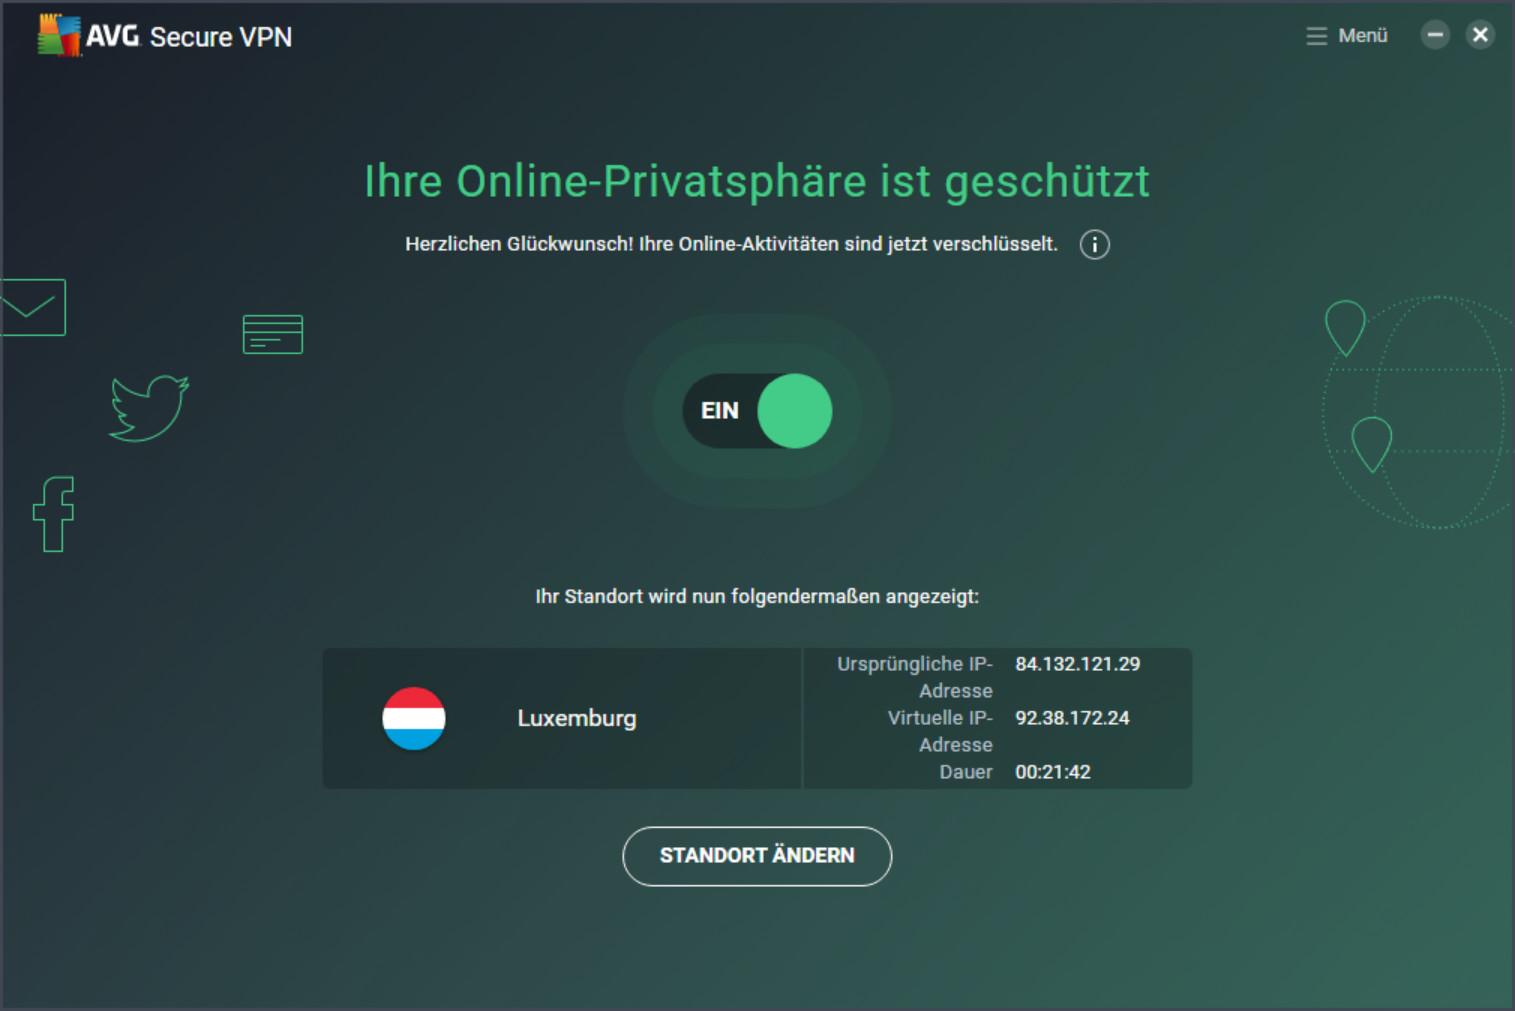 Screenshot 1 - AVG Secure VPN